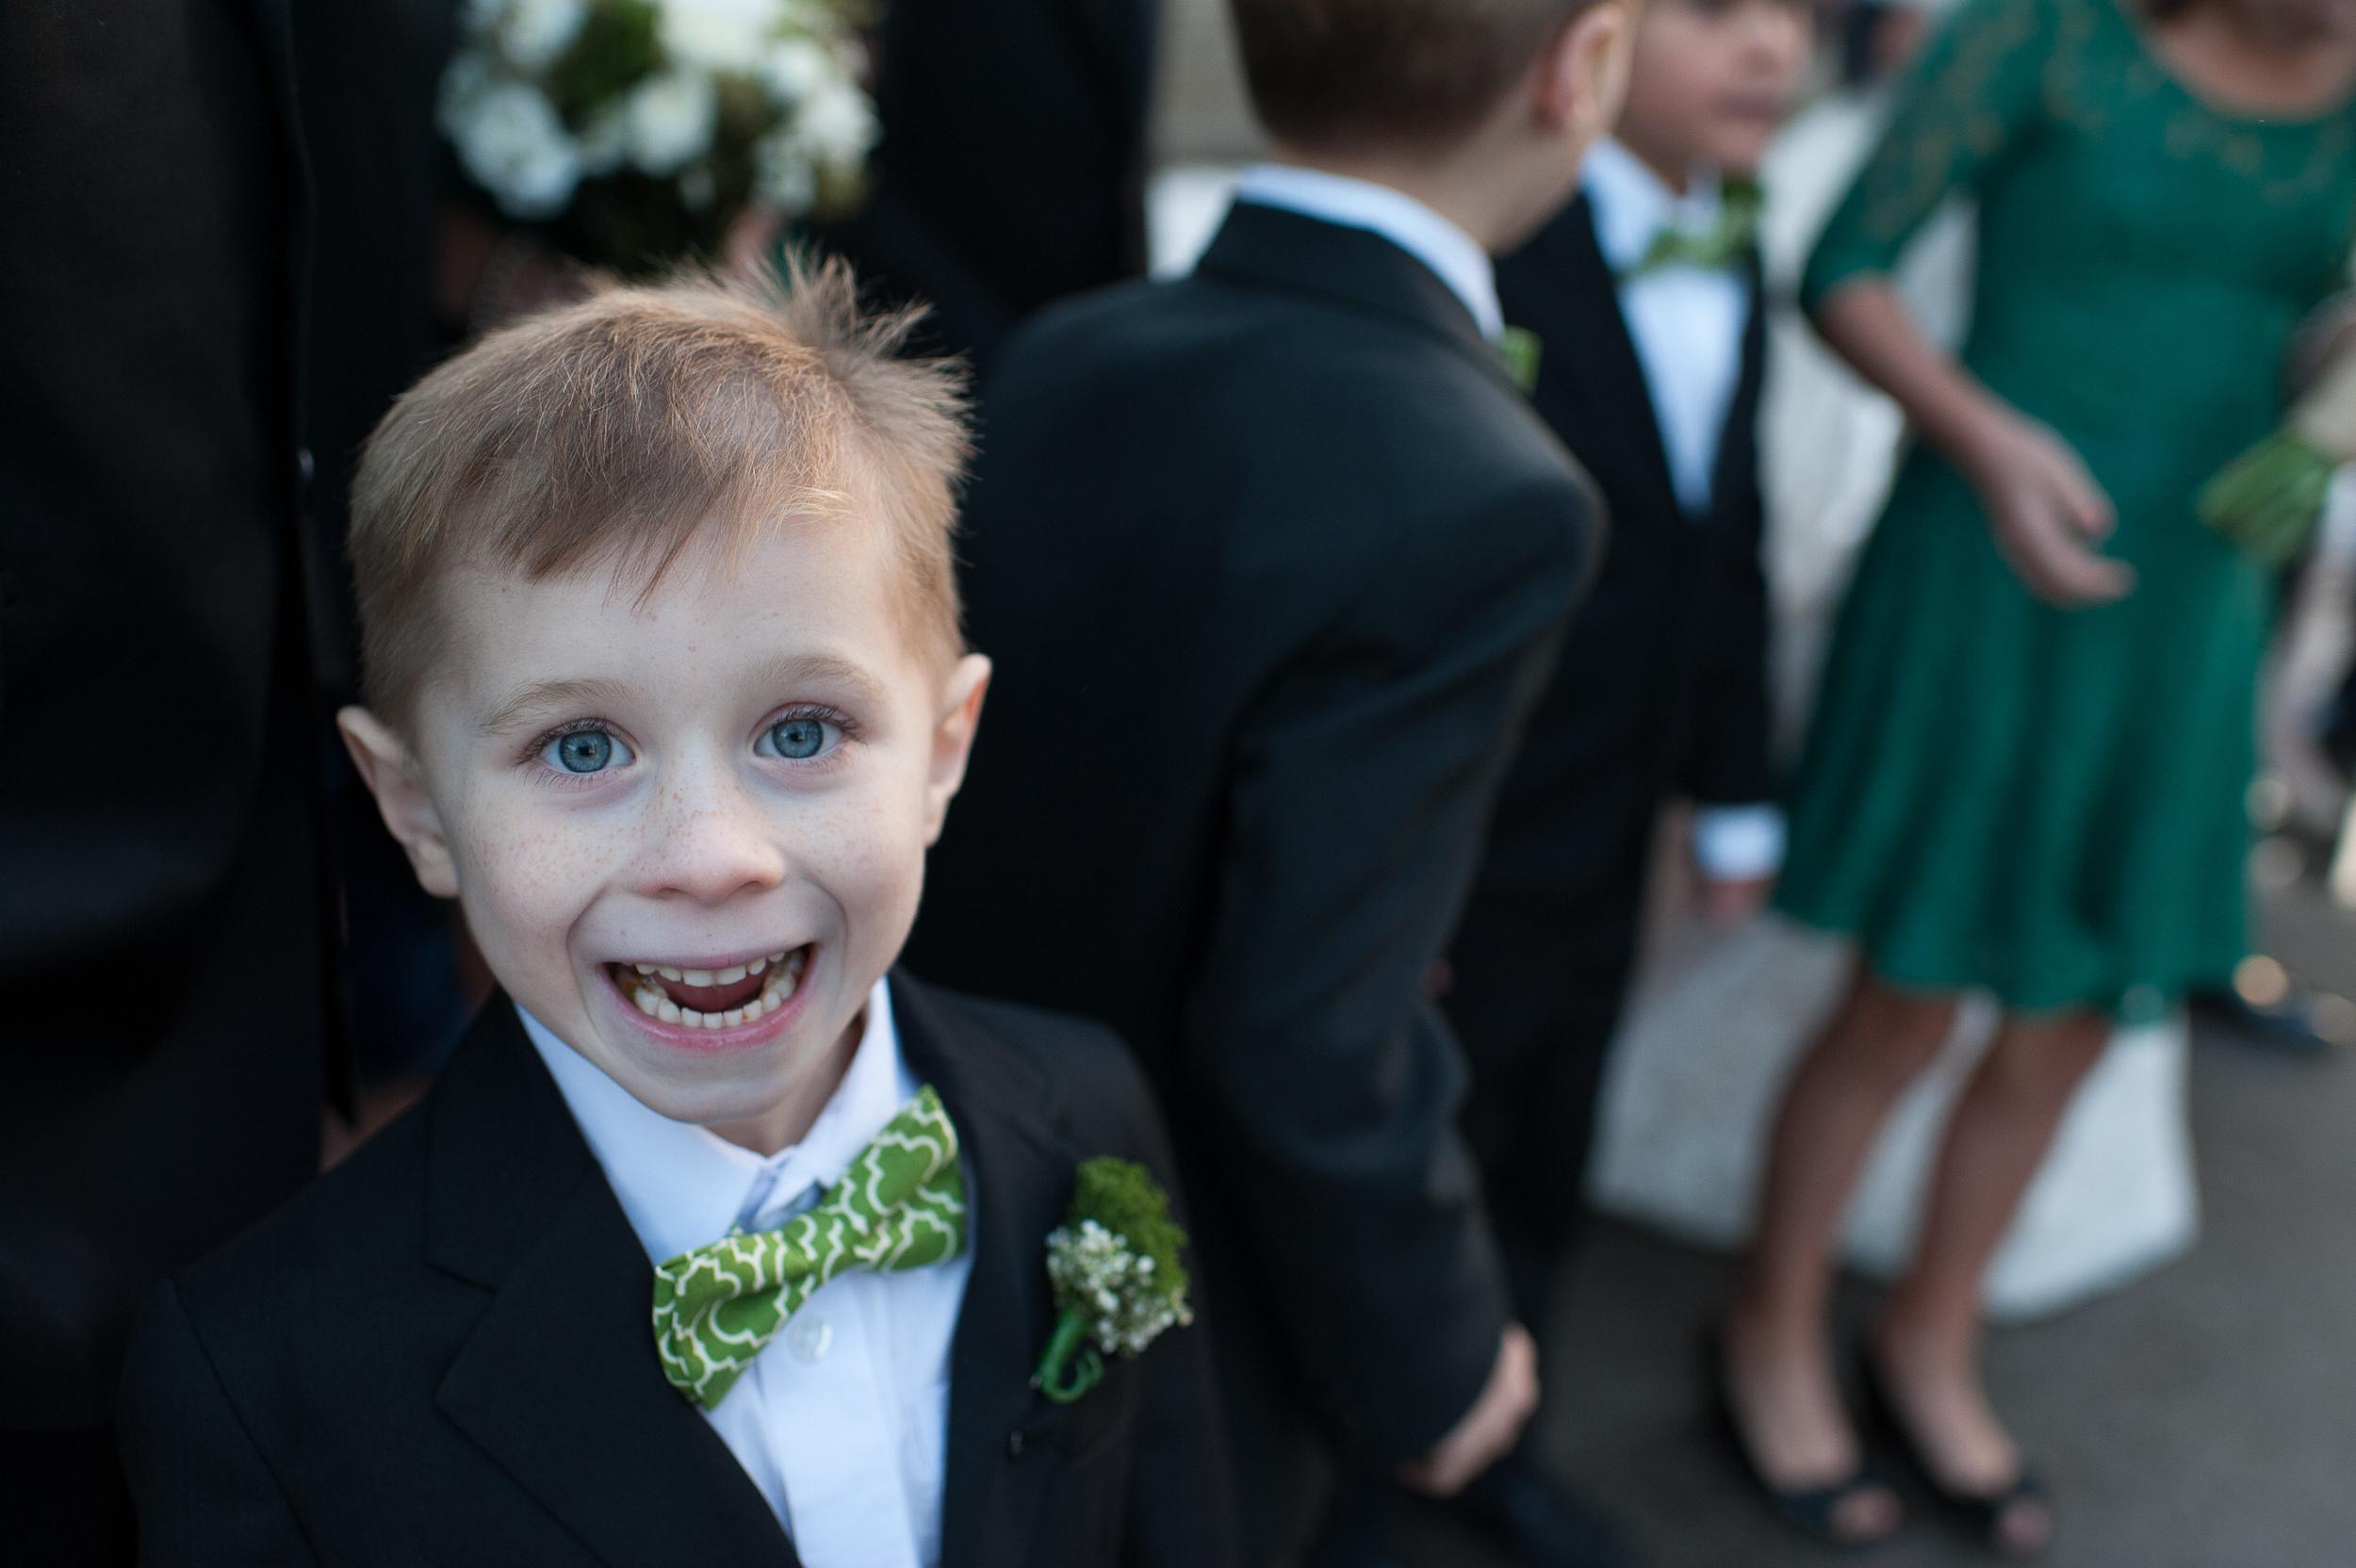 enoch-turner-wedding-photograph-007.jpg